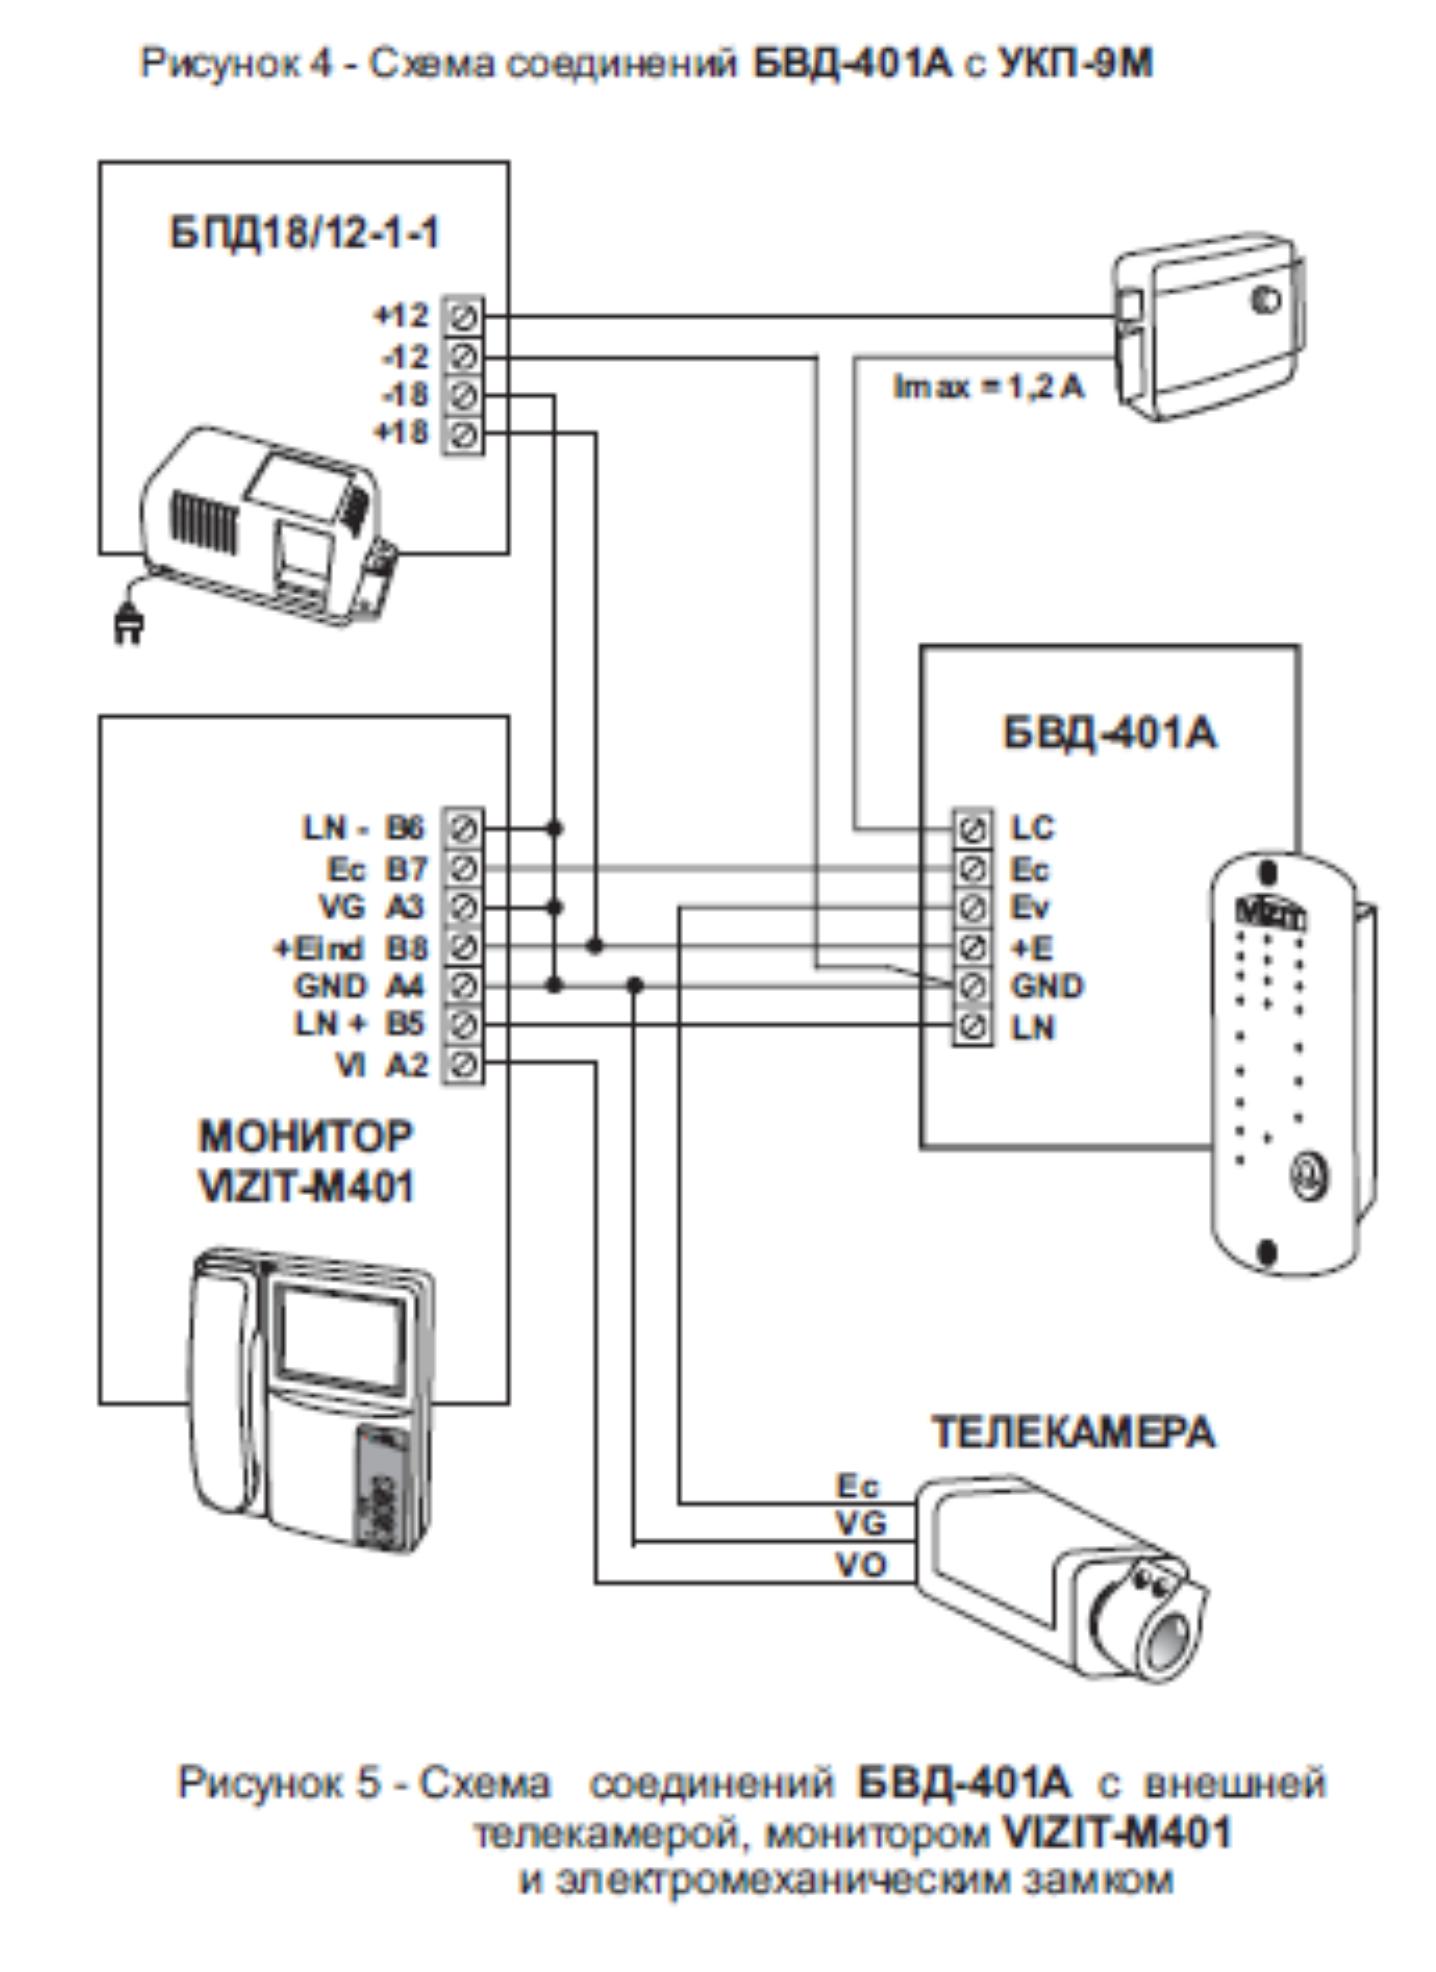 Схема подключения домофона с электрозамком фото 147